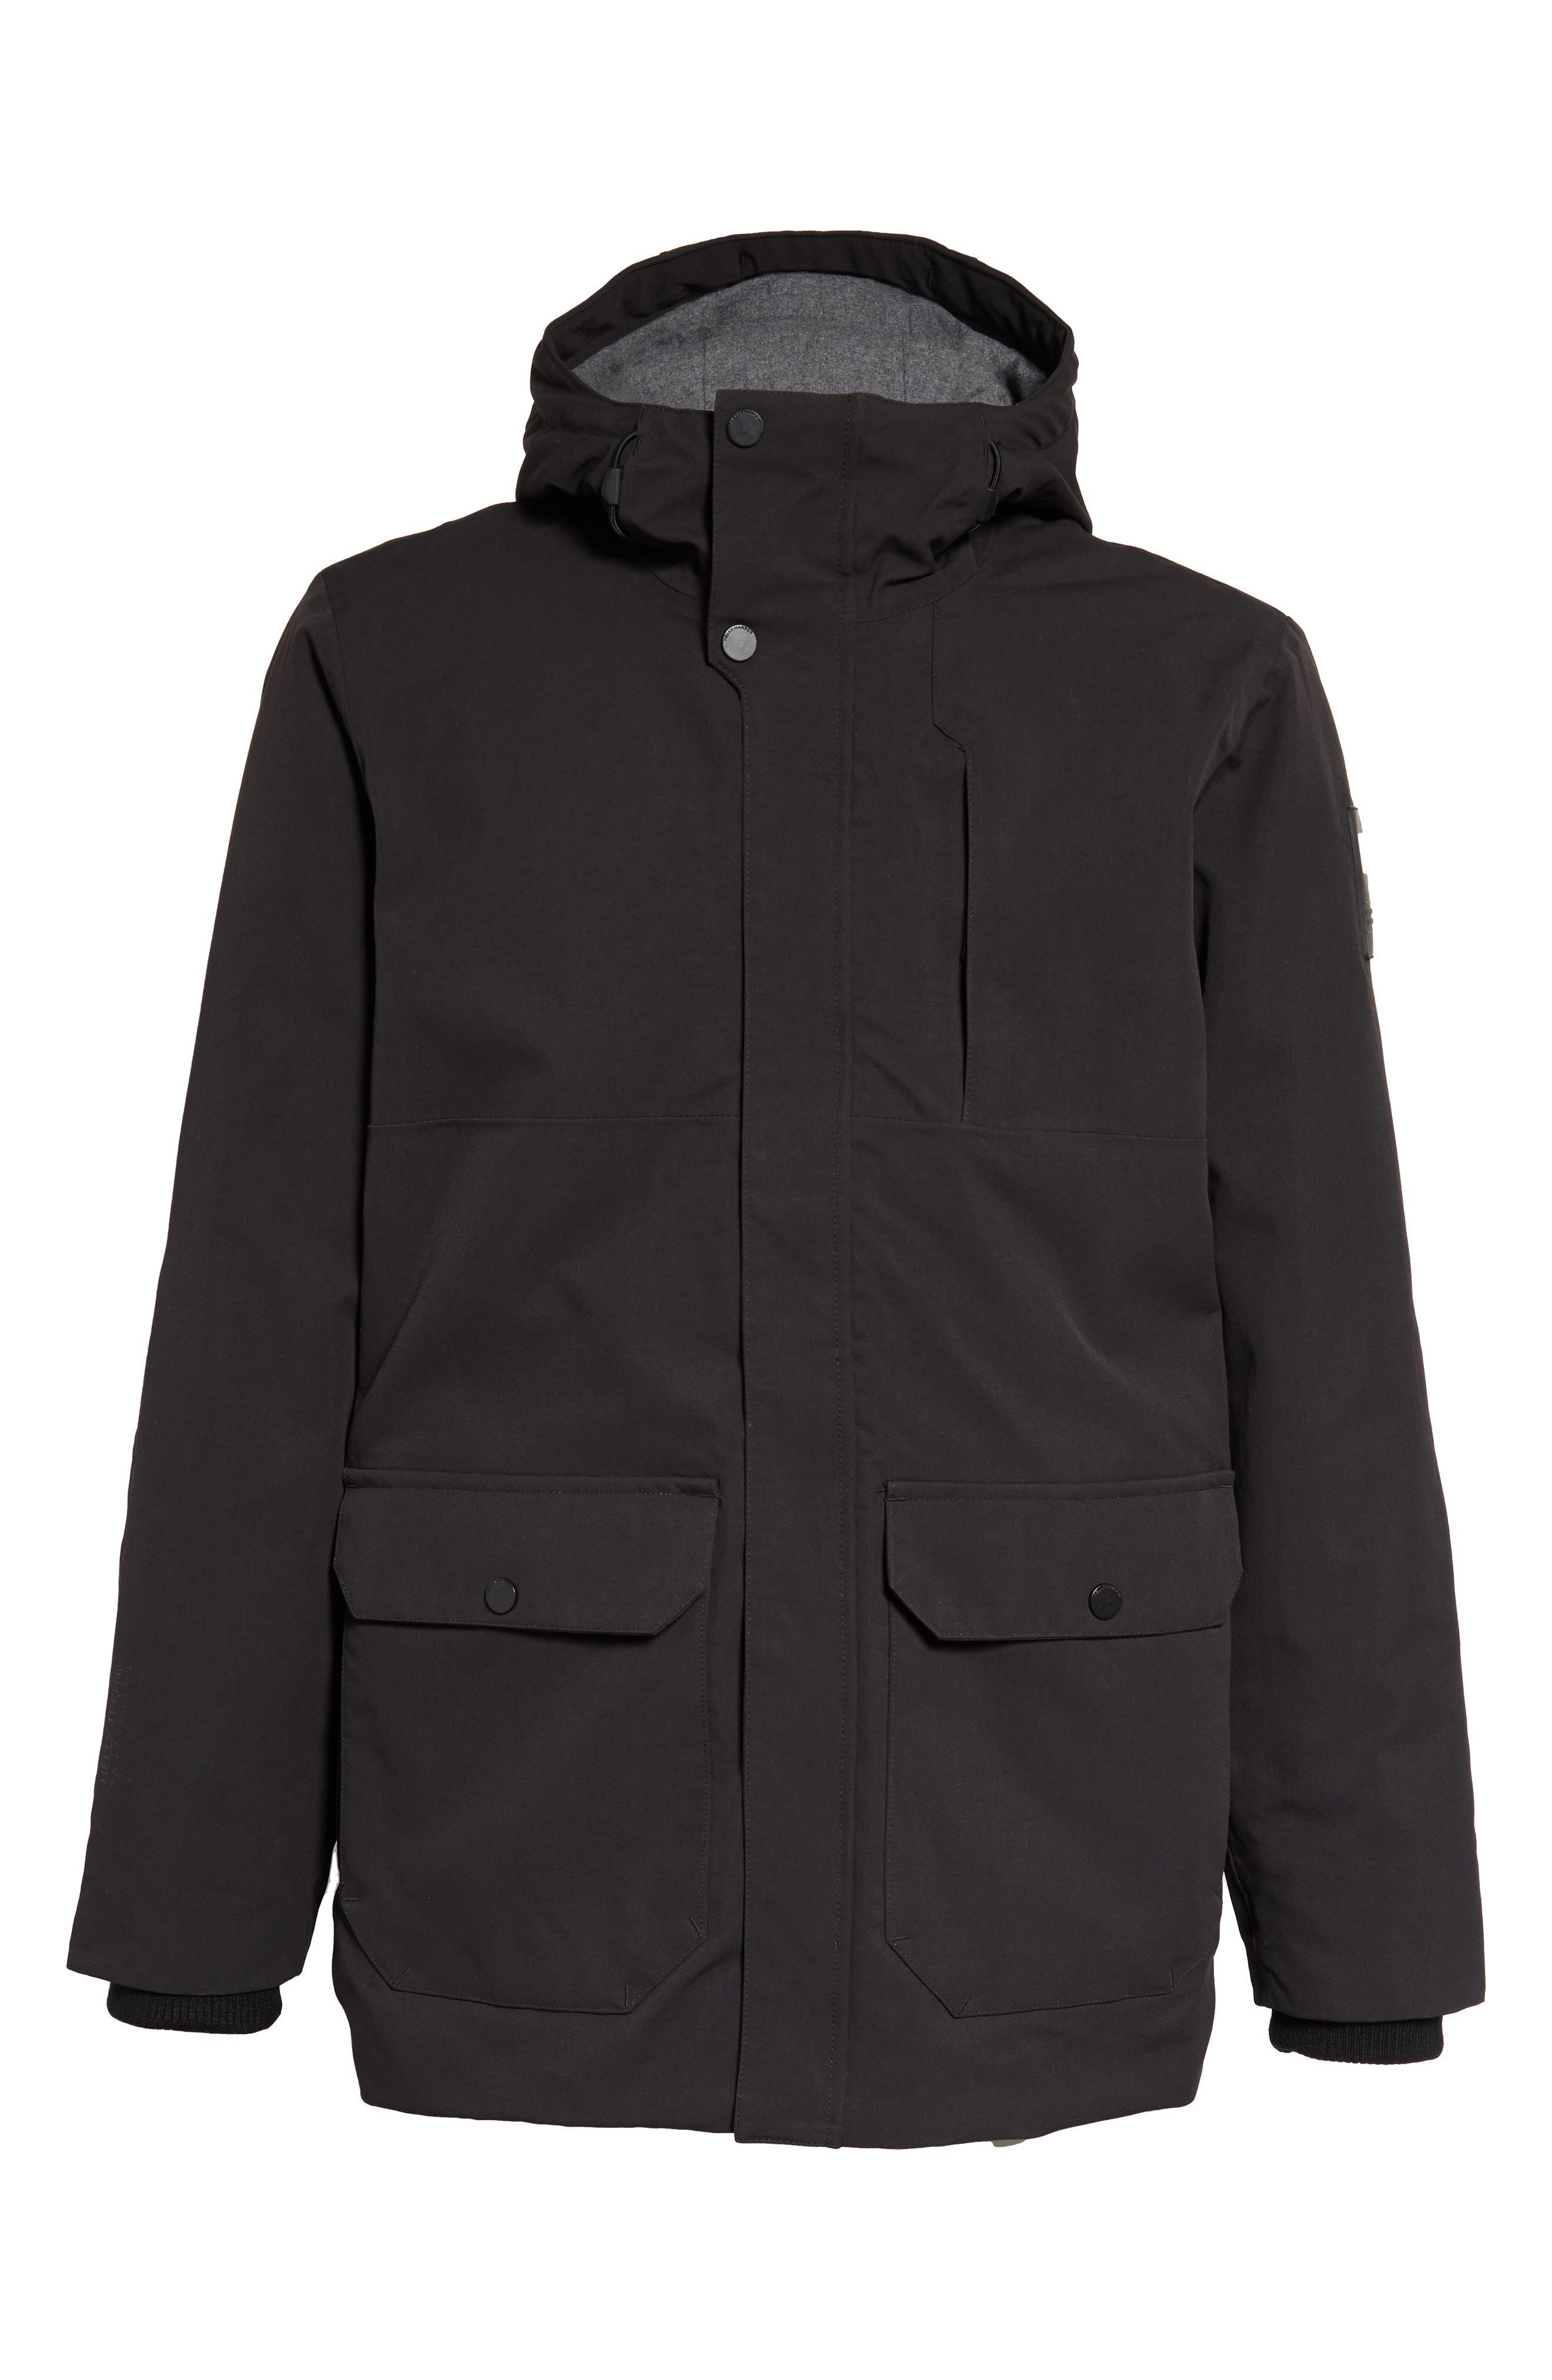 Urban Windproof & Waterproof Primaloft<sup>®</sup> Long Jacket,                             Alternate thumbnail 5, color,                             BLACK